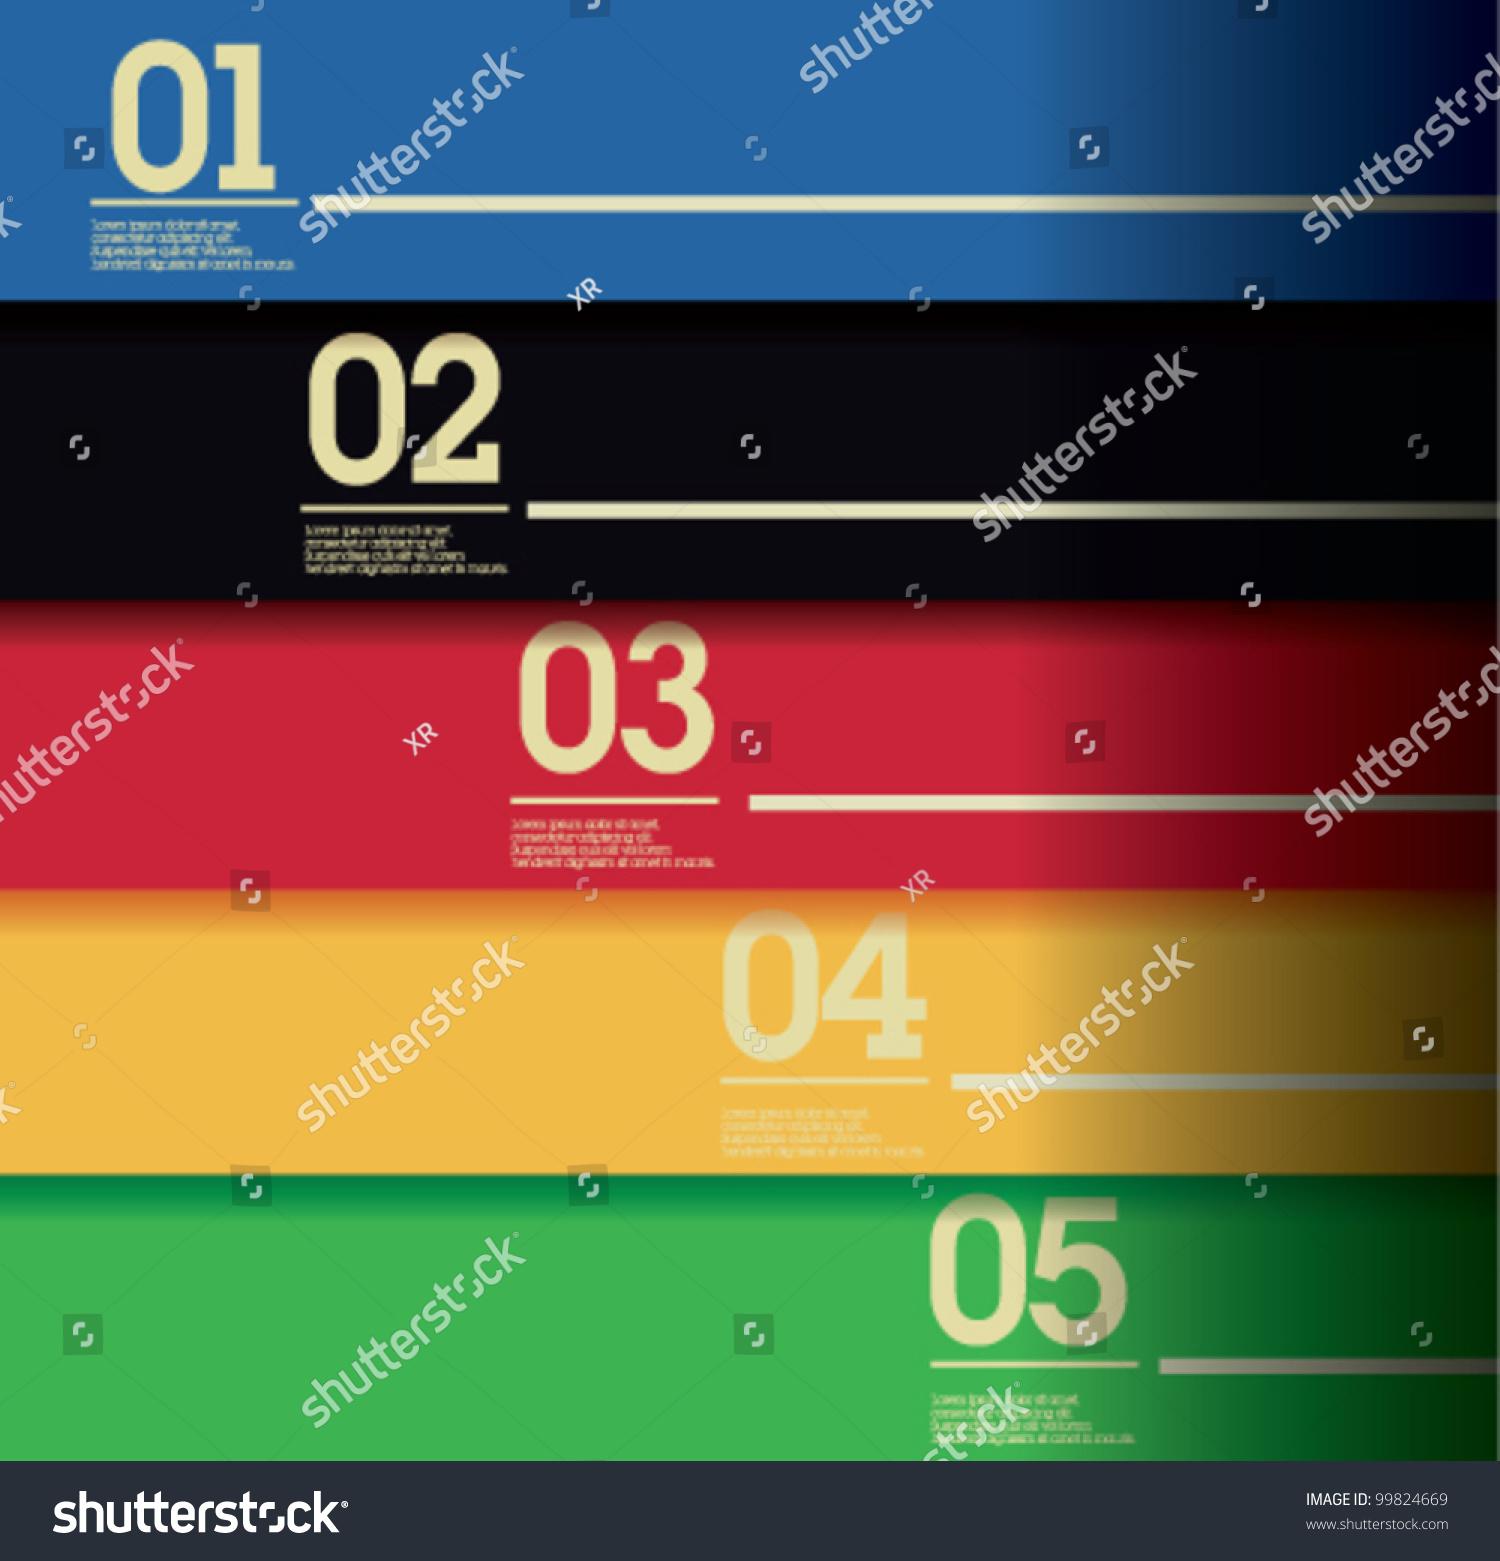 Colorful Web Design Template Stock Vector (2018) 99824669 - Shutterstock